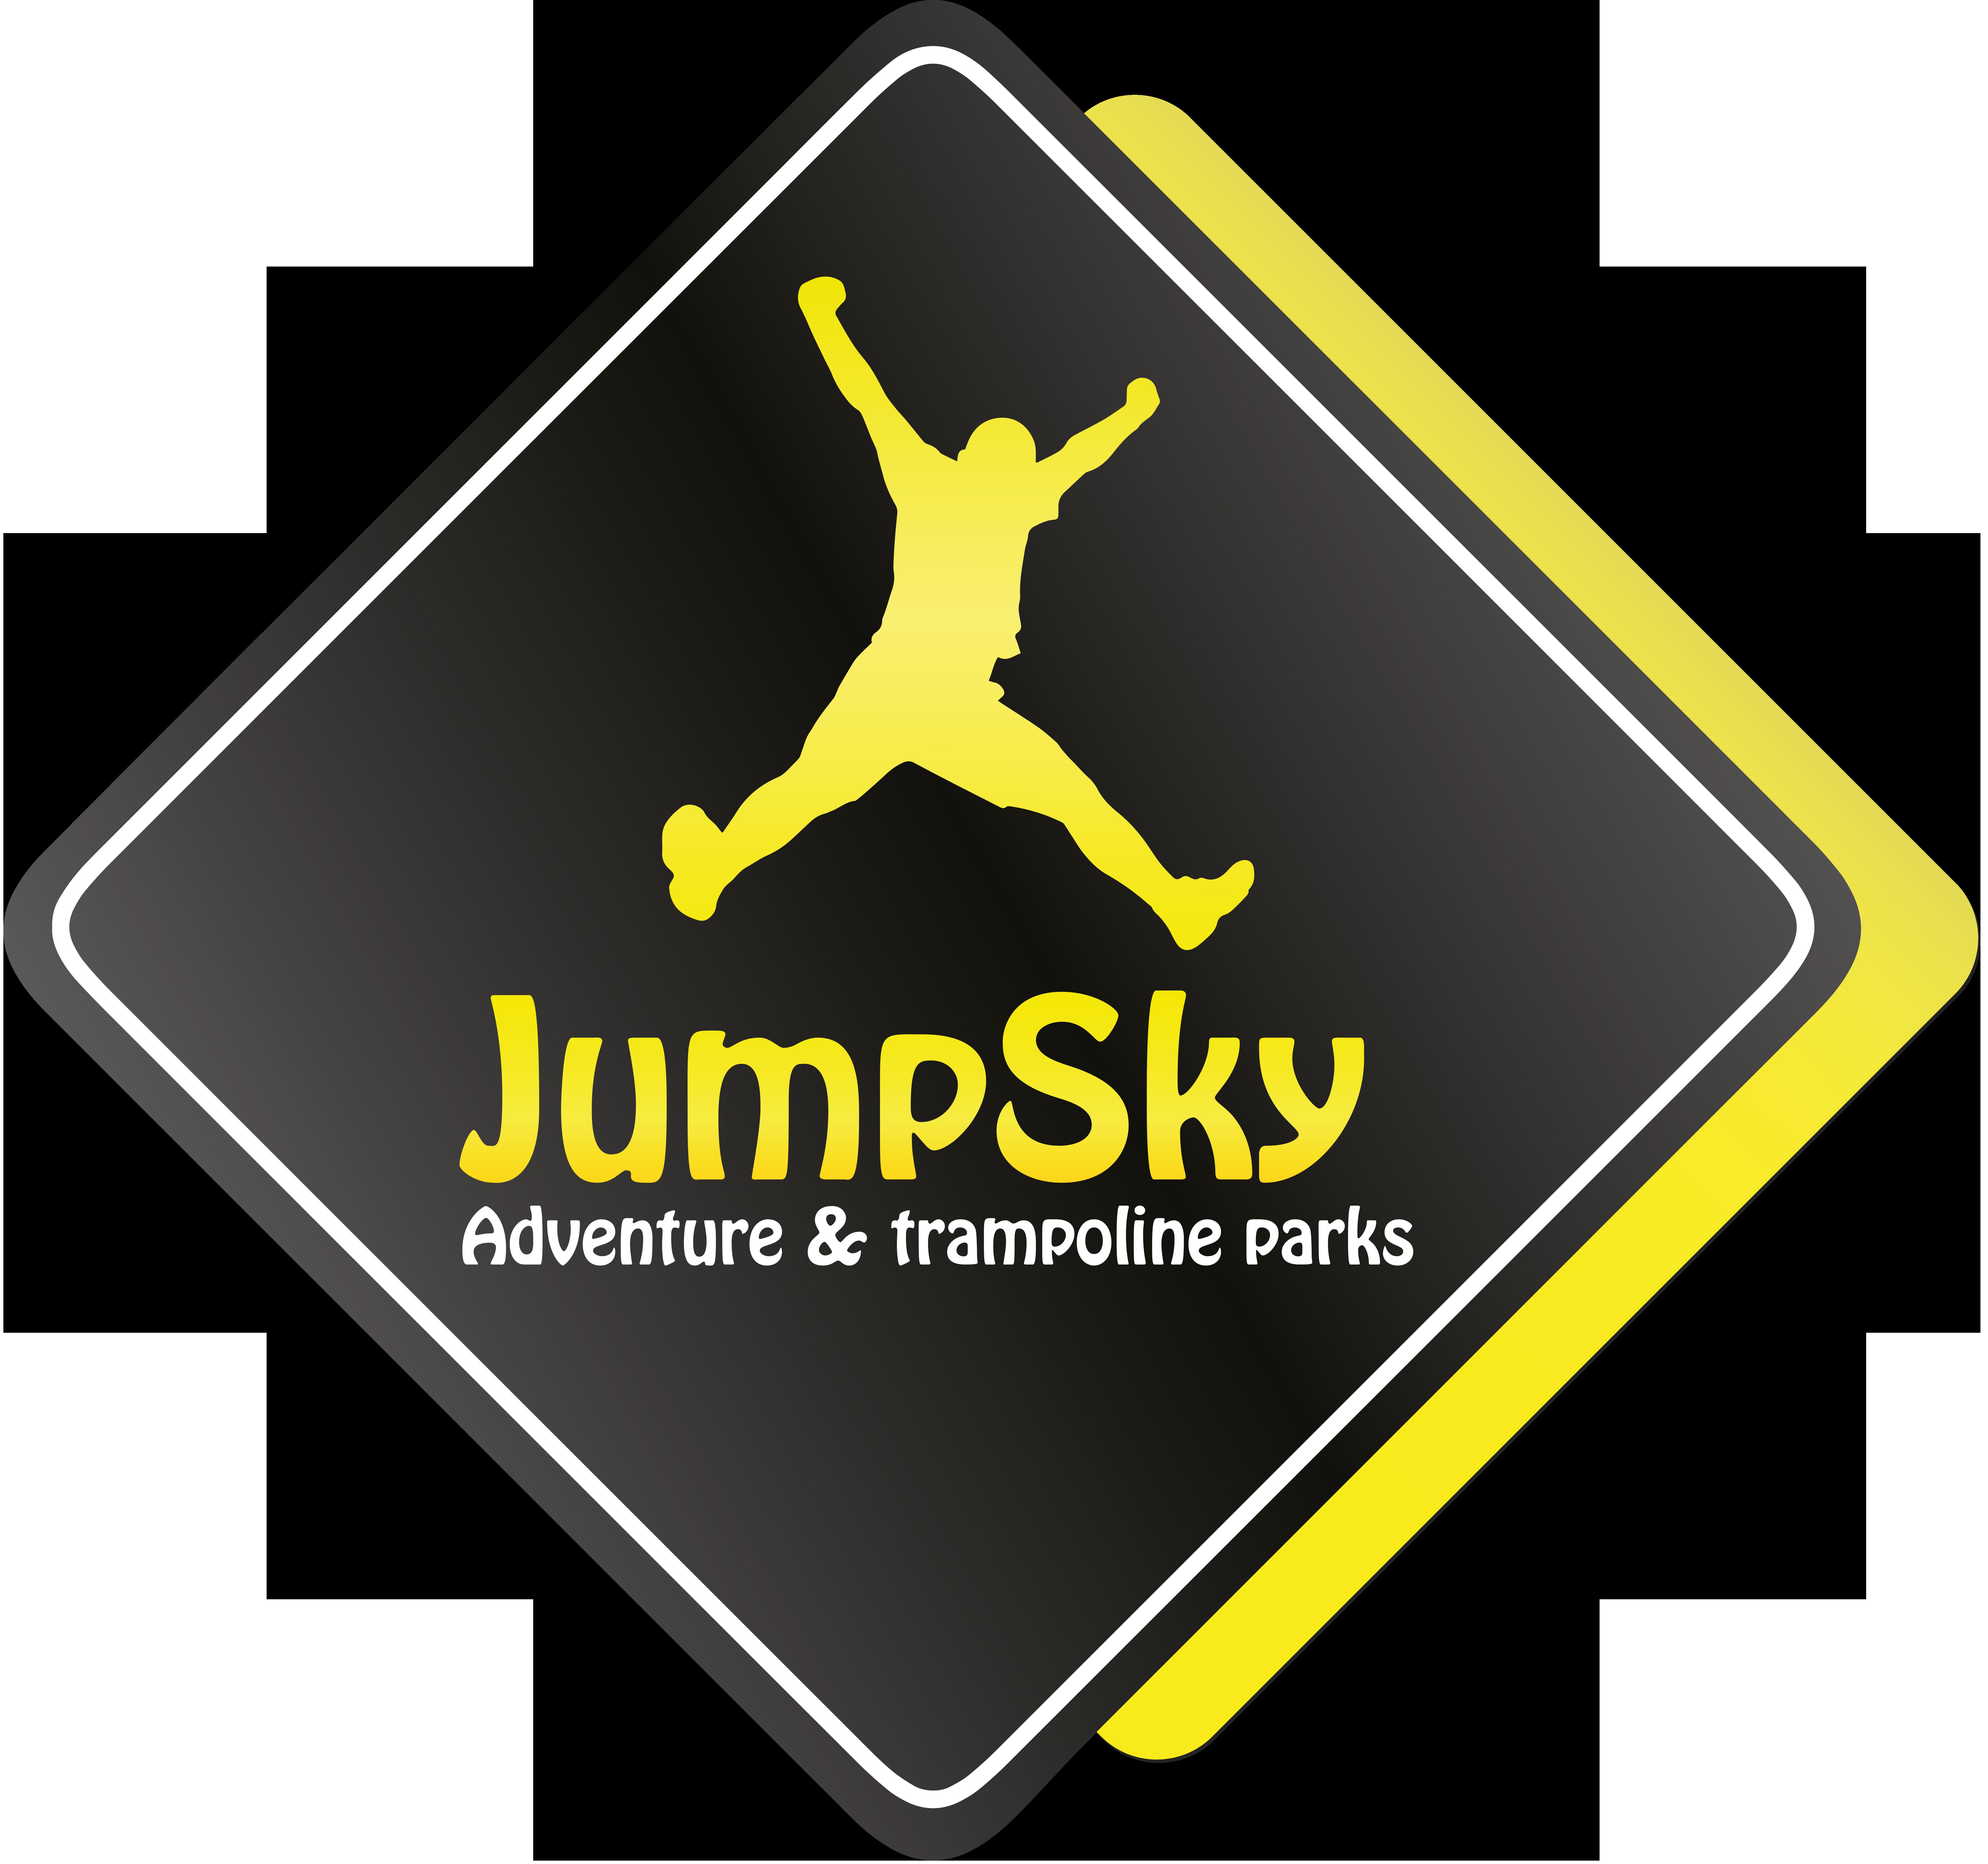 Logo JumpSky